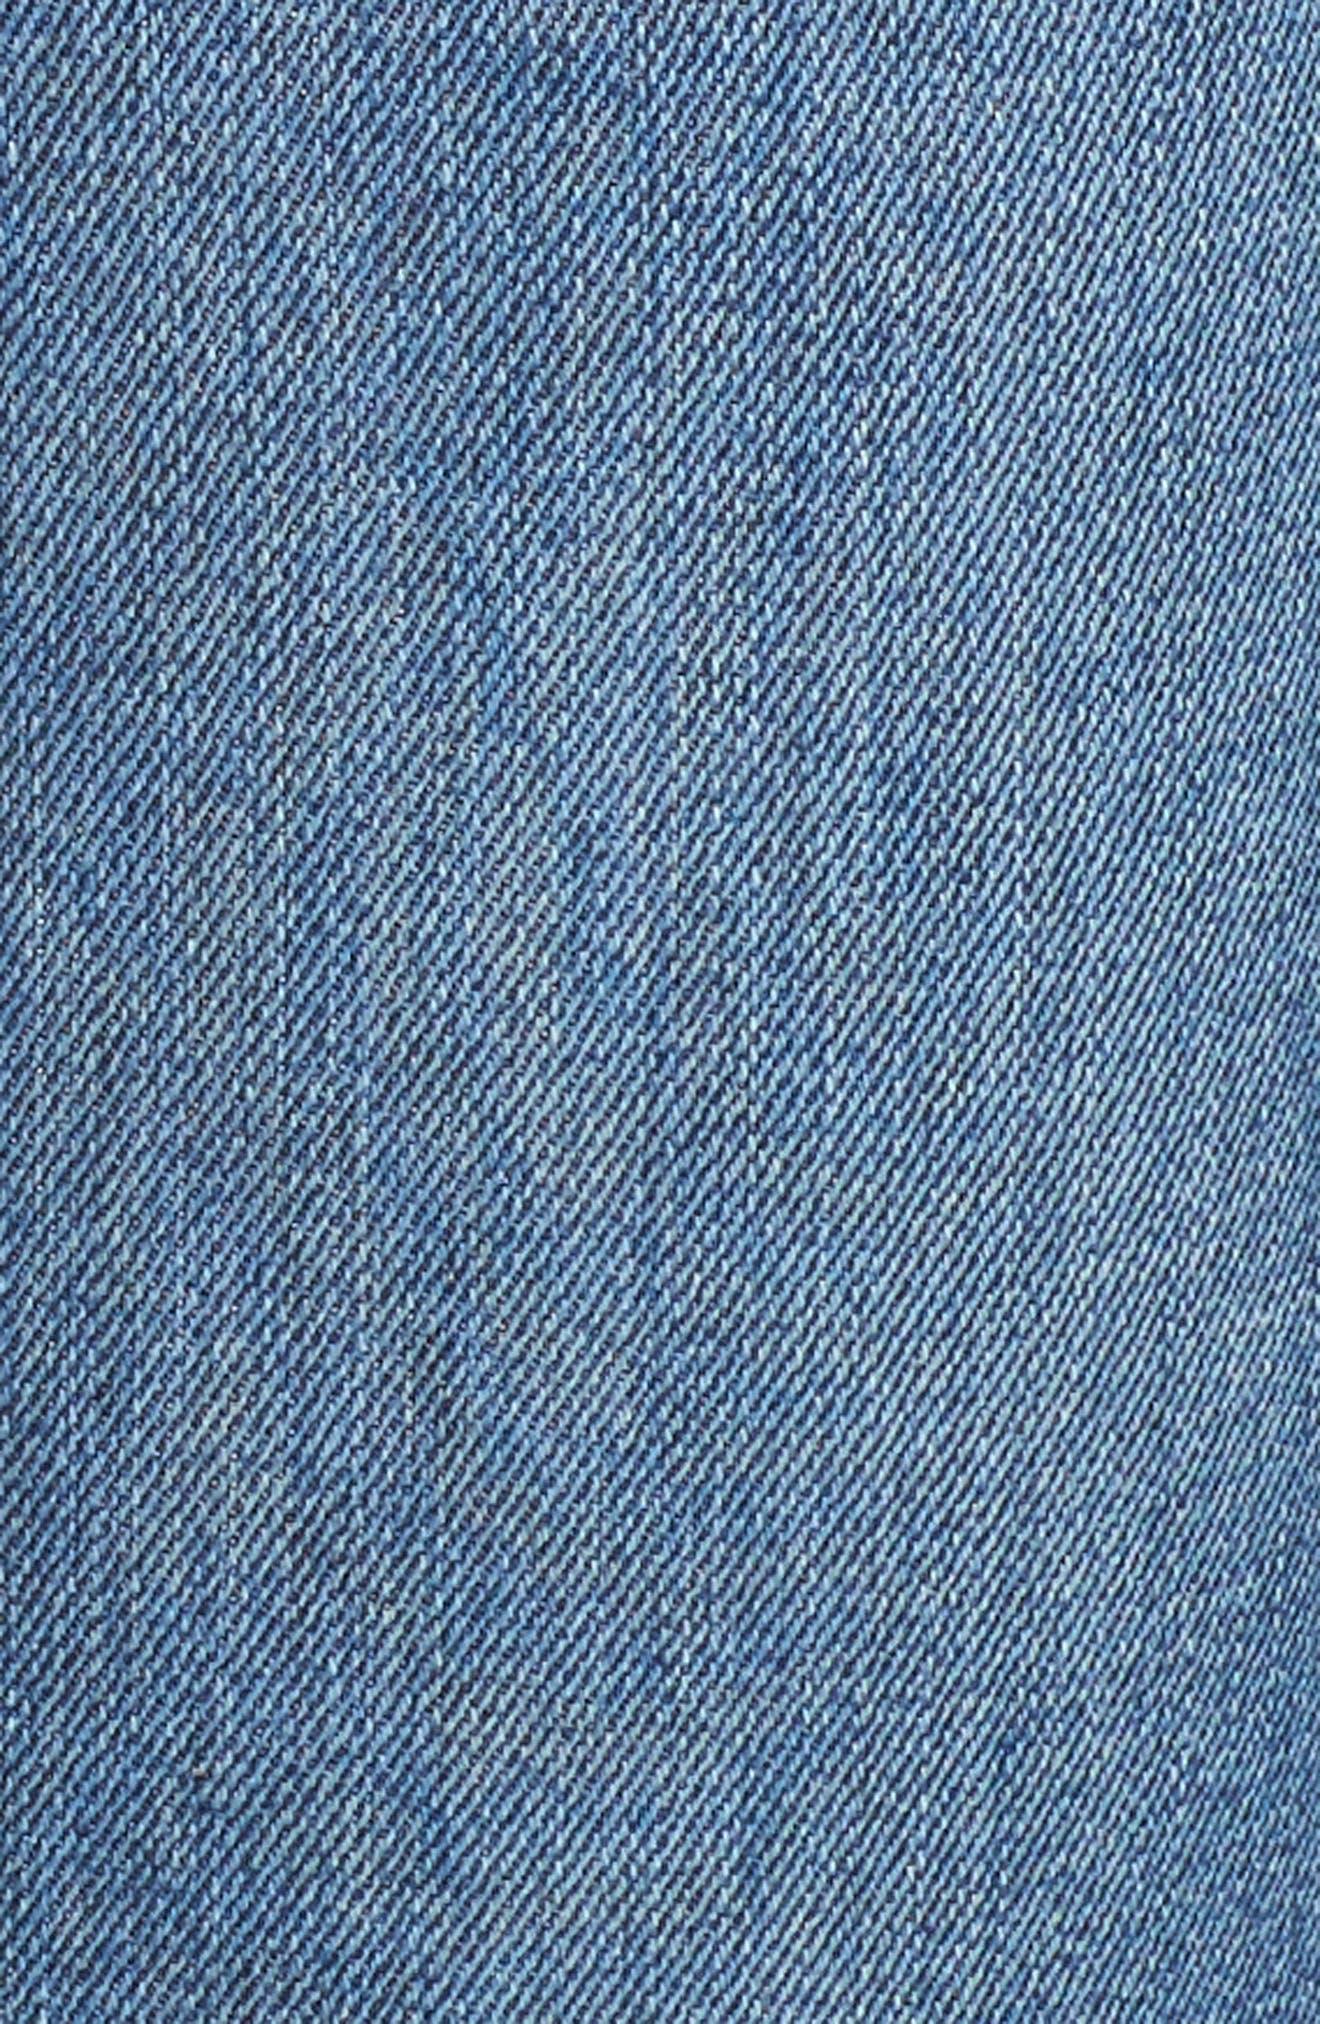 Bombshell Raw Hem Stretch Skinny Jeans,                             Alternate thumbnail 6, color,                             426